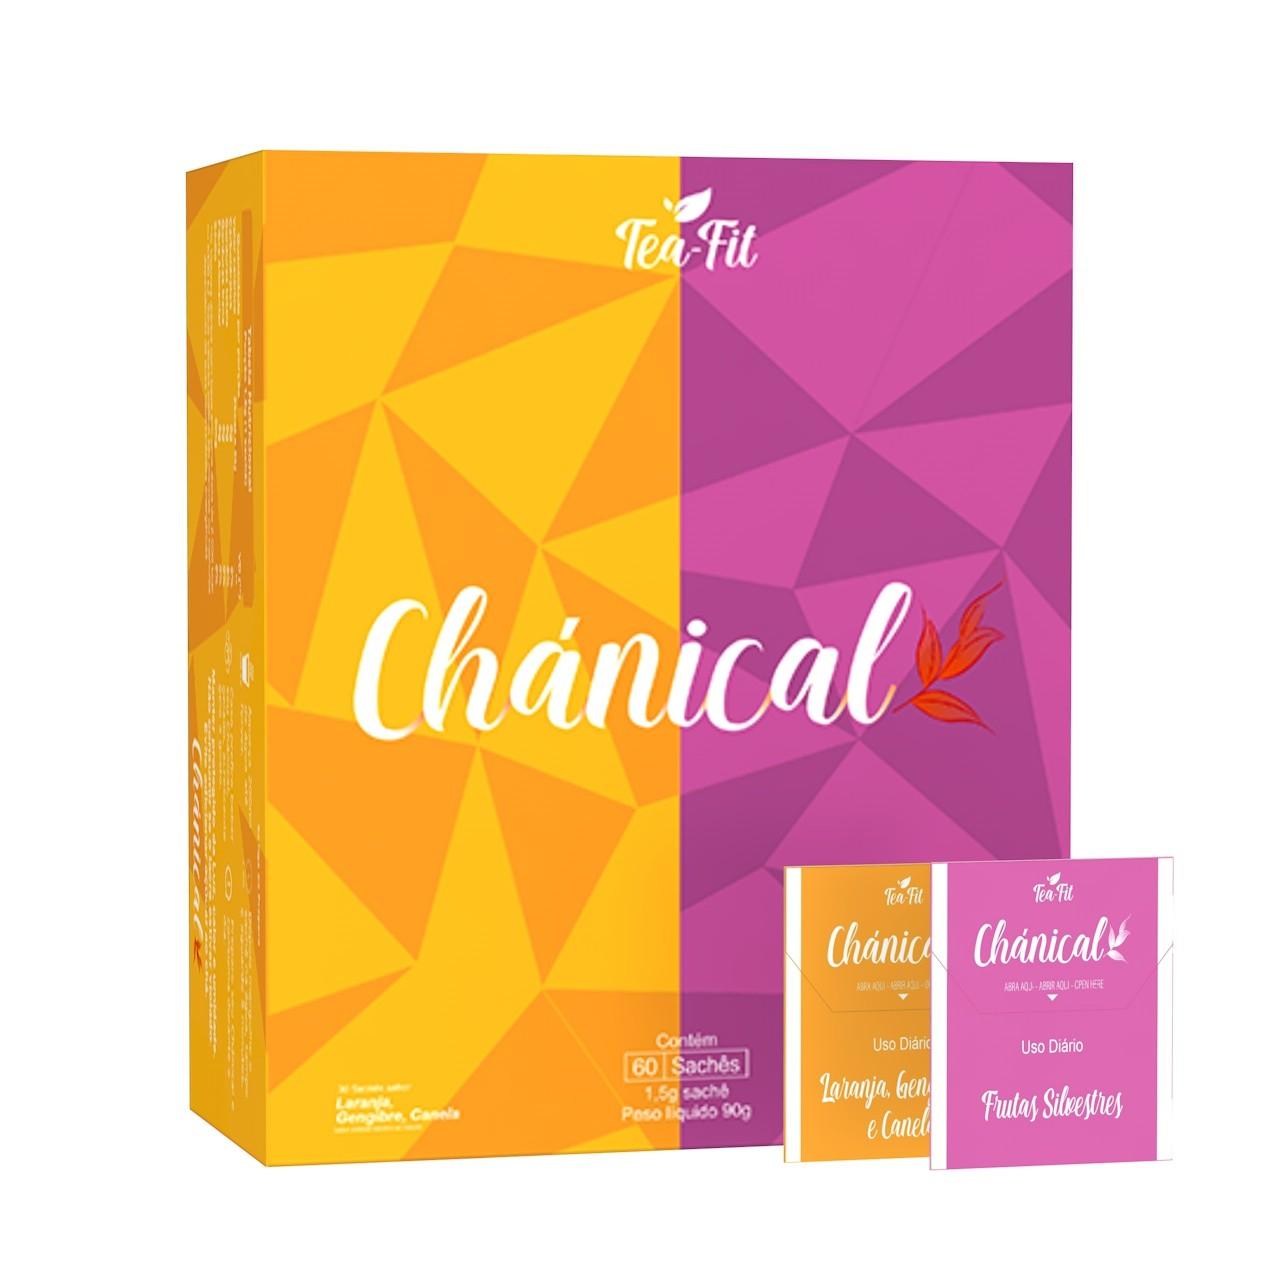 Chánical Tea-Fit 60 Saches Frutas Silvestre e Laranja, Gengibre e Canela  - KFit Nutrition